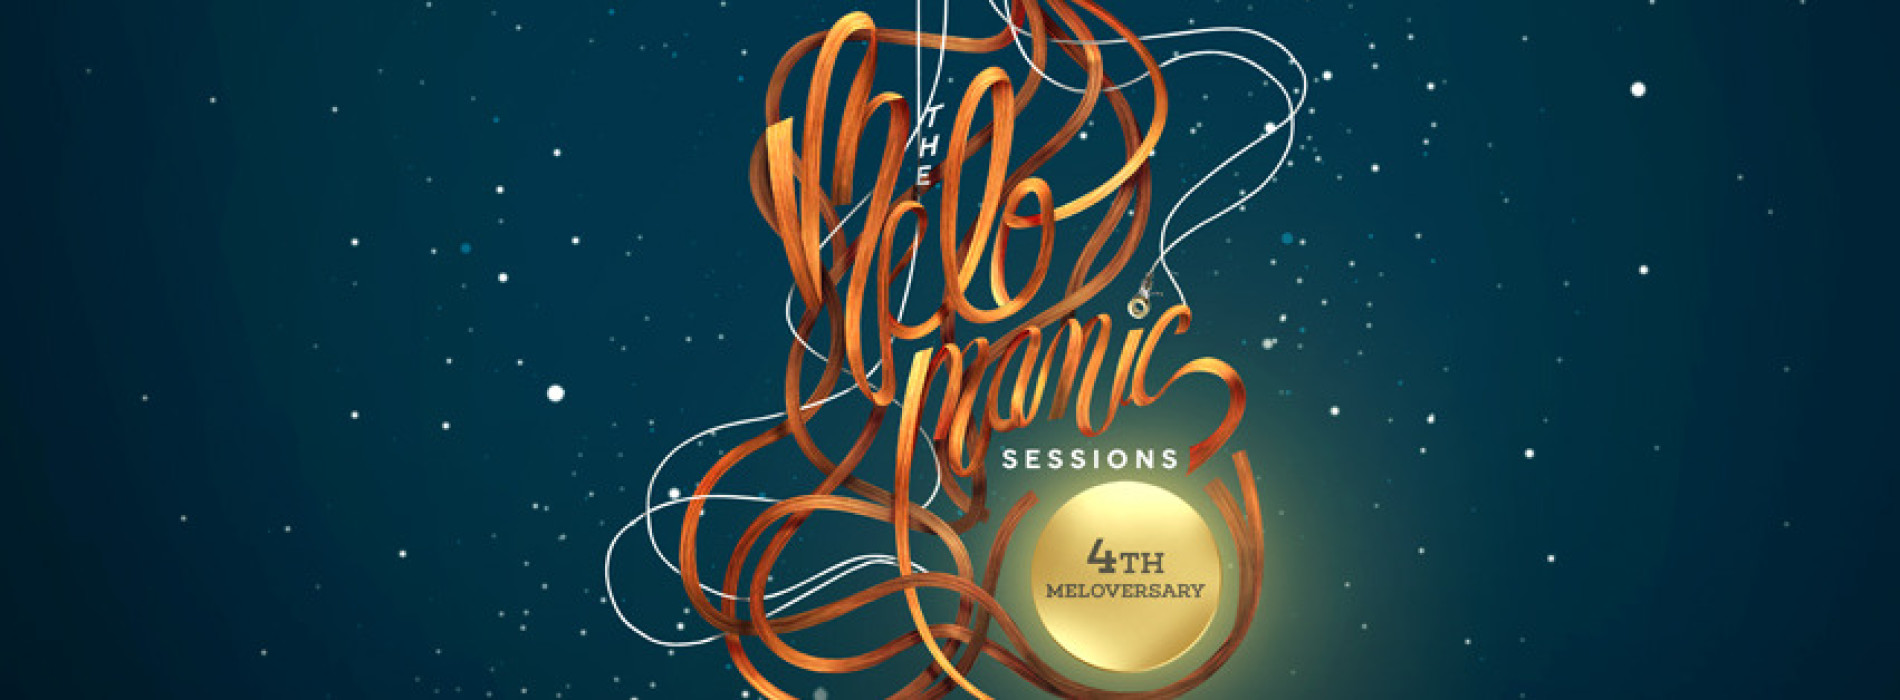 Melomanic Sessions – Nov 2015 (Rustic Homeware)